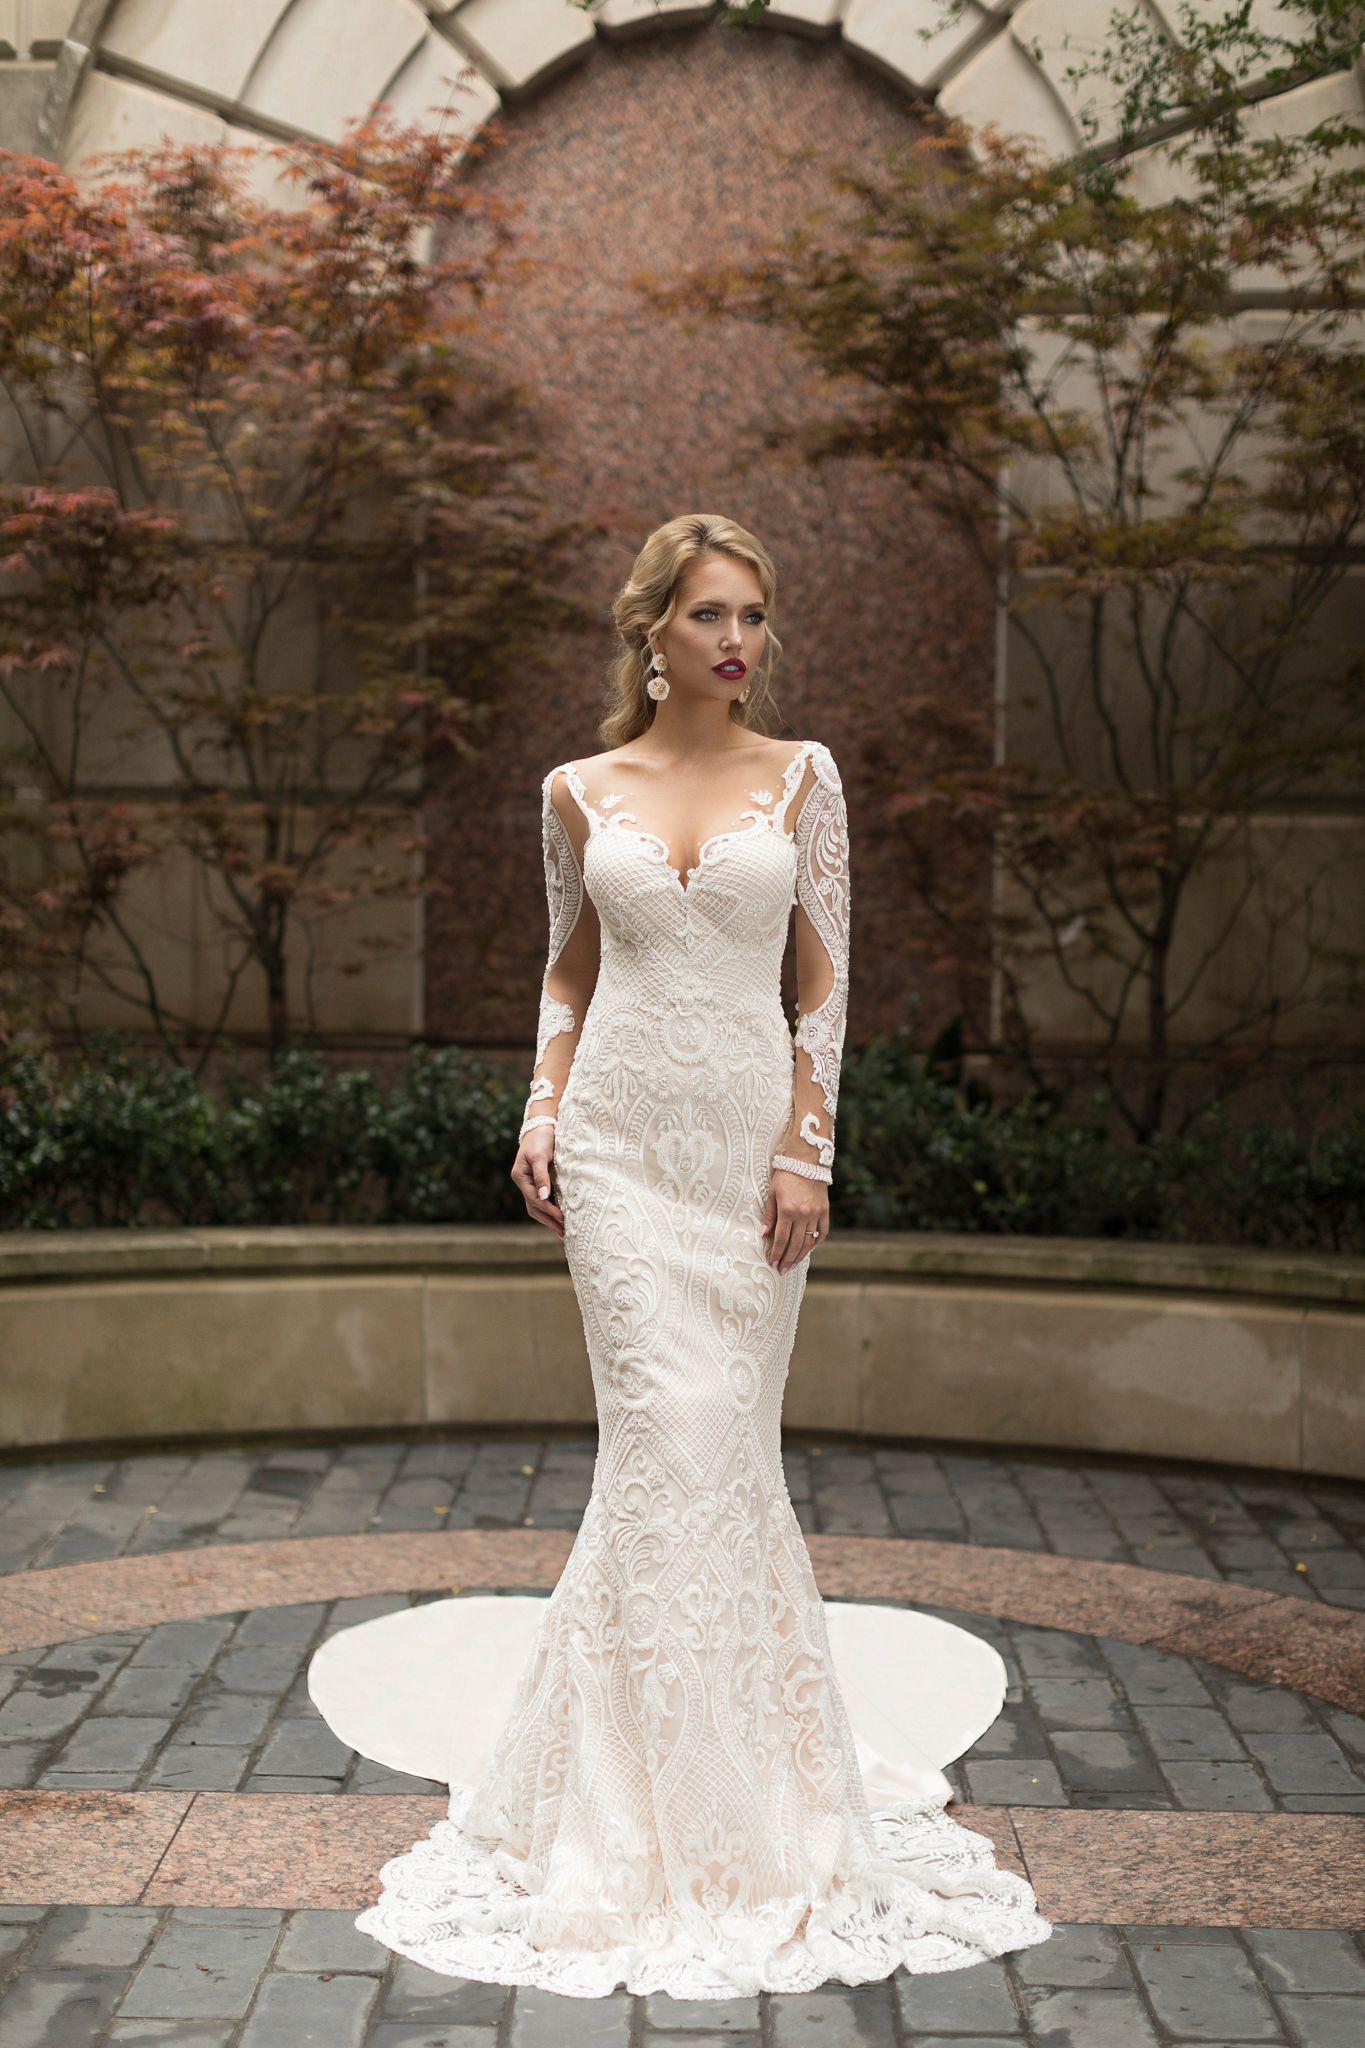 Couture Haute wedding dresses pinterest pictures